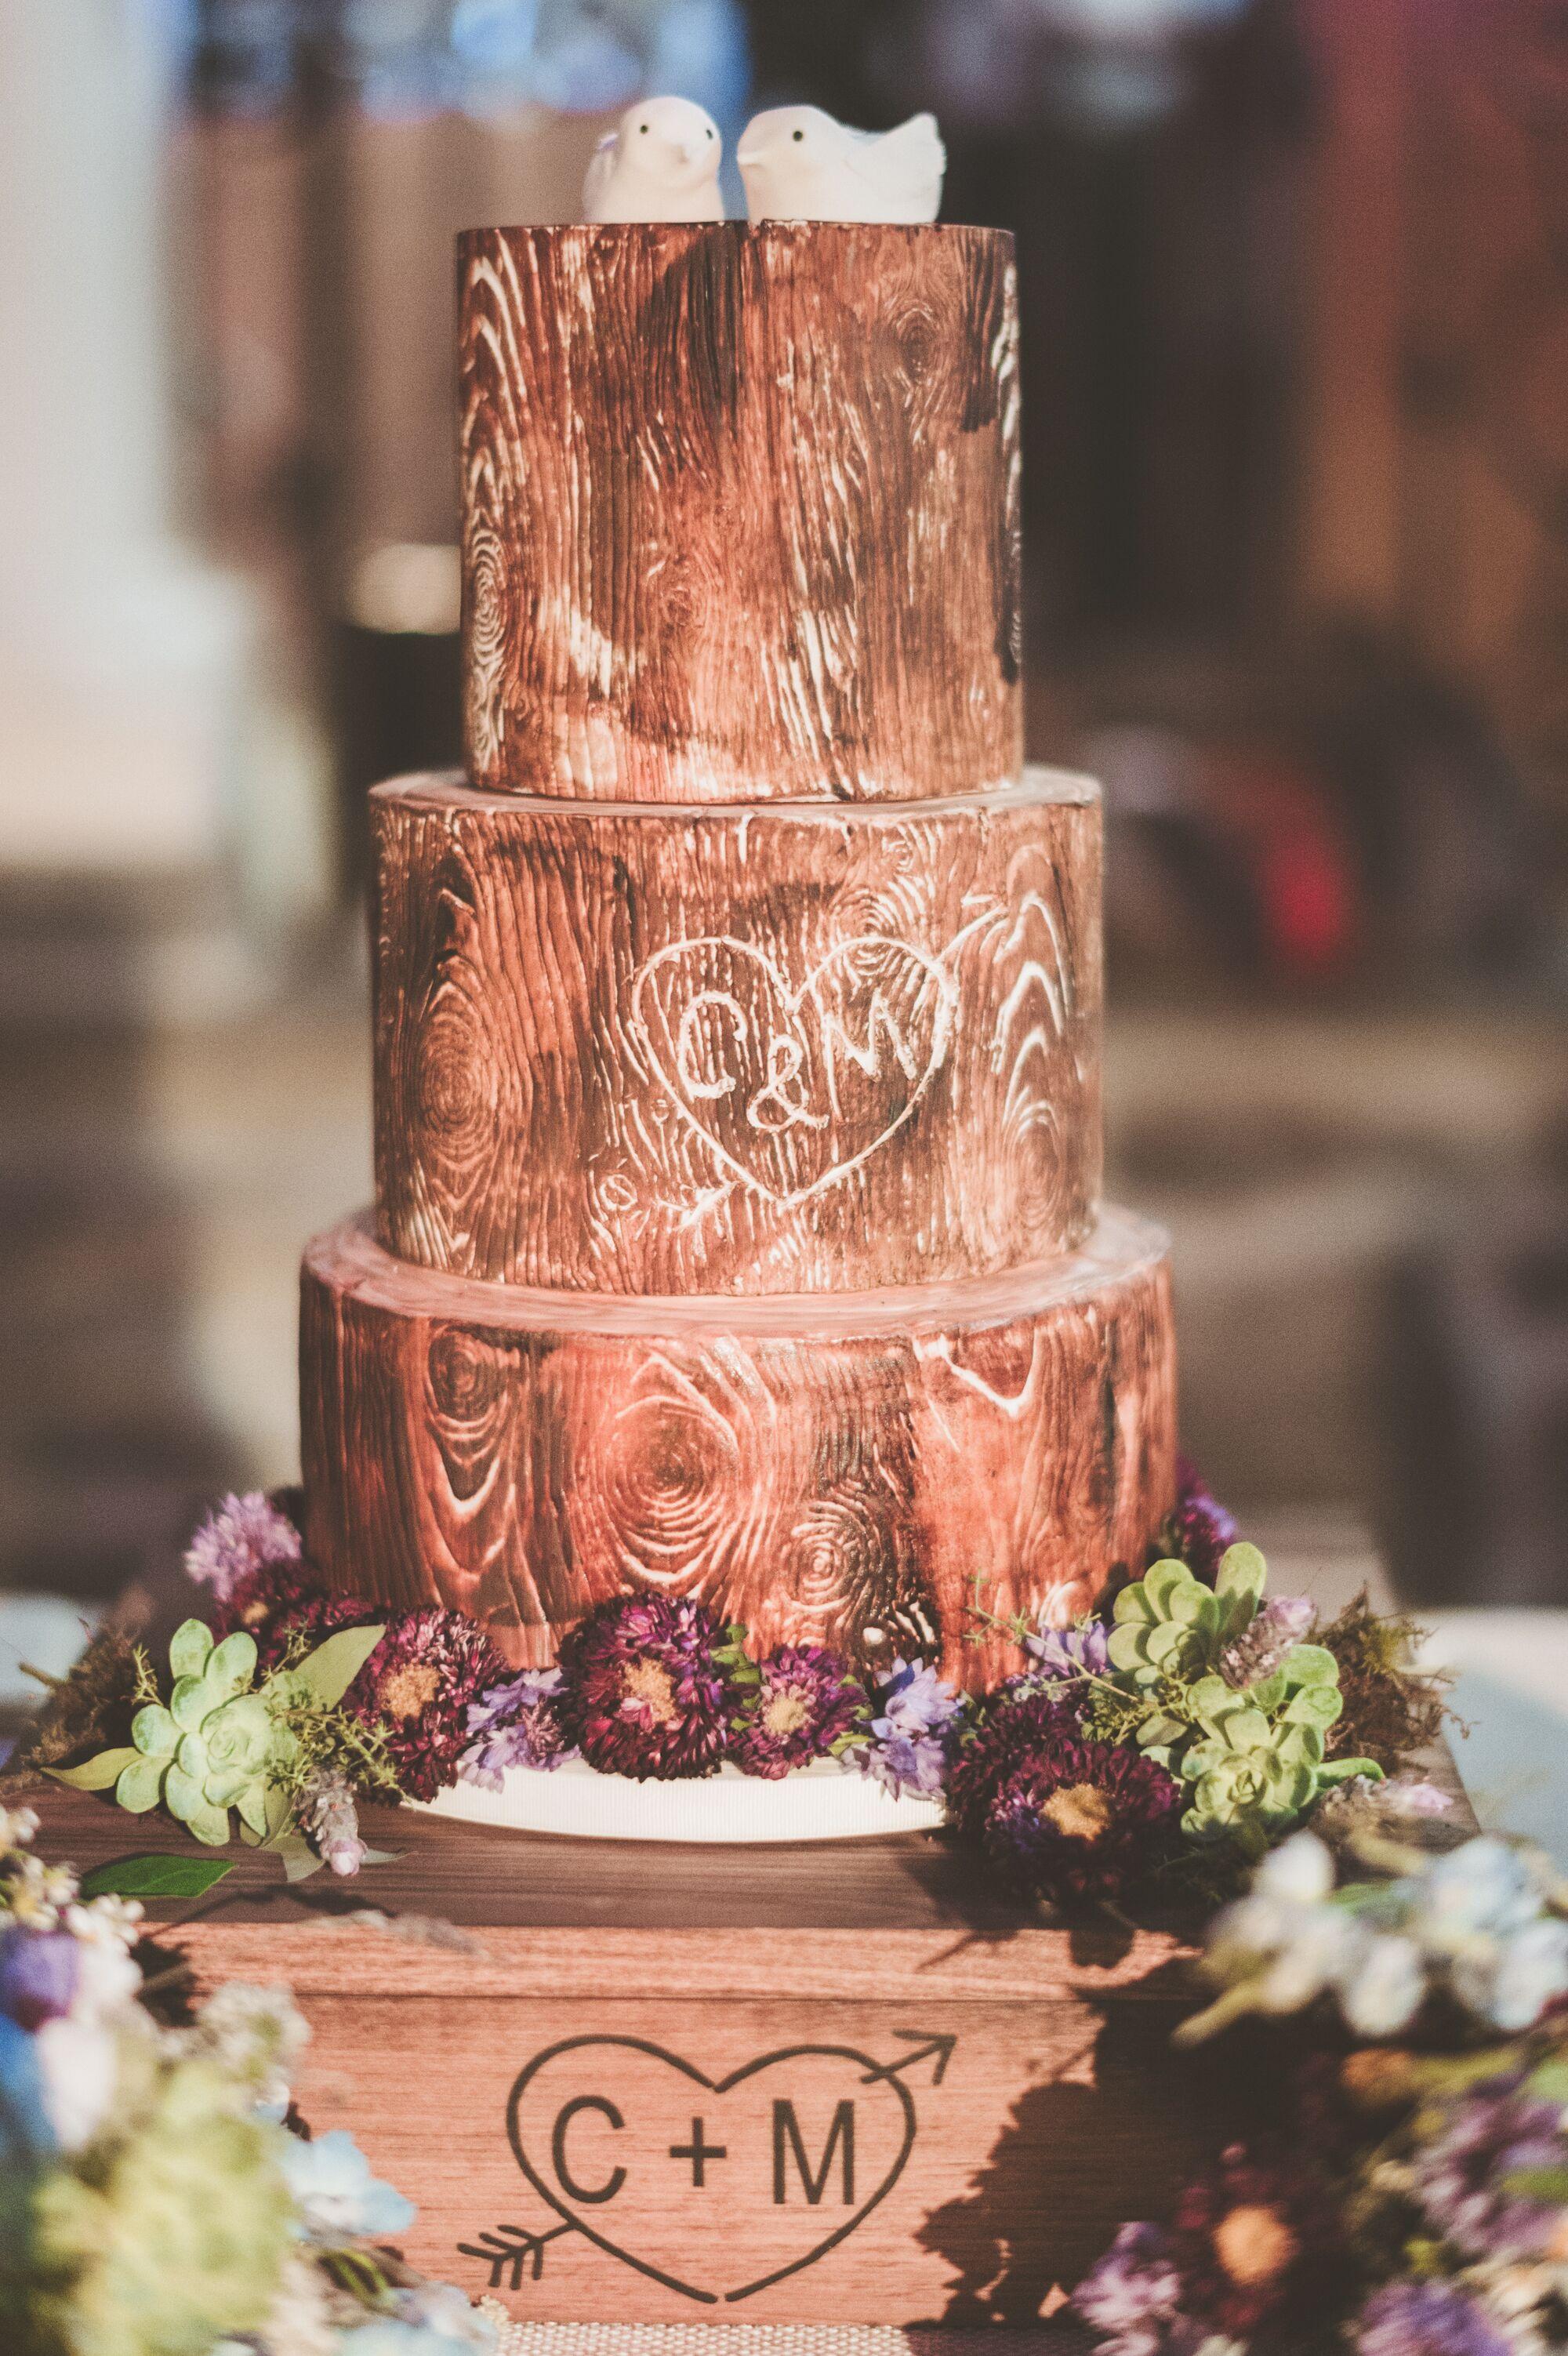 Woodgrain Wedding Cake. Wrapped Rings. Diamond Lorraine Schwartz Engagement Rings. Saphire Engagement Rings. Elevated Engagement Rings. Precious Engagement Rings. Wisconsin Badgers Rings. Super Engagement Rings. Composite Wedding Rings